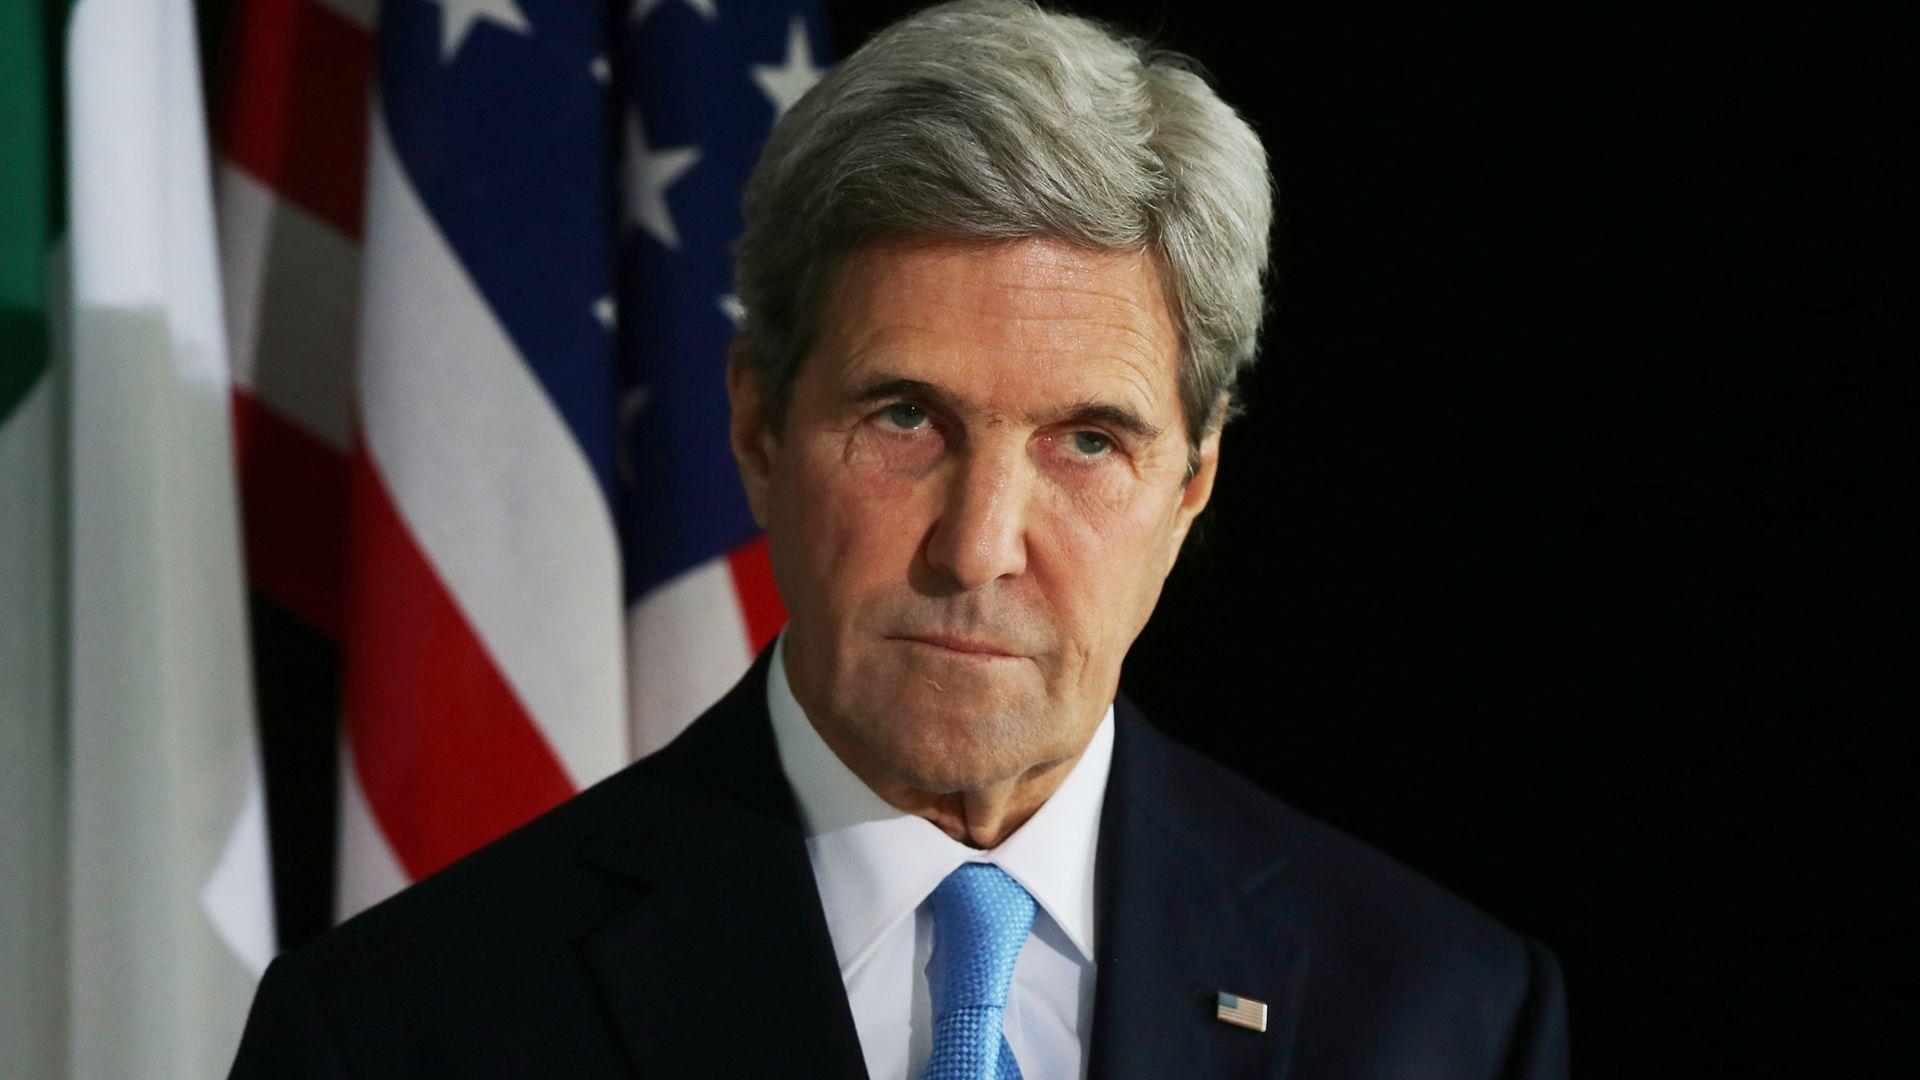 John Kerry is Joe Biden's climate envoy - Credit: PA